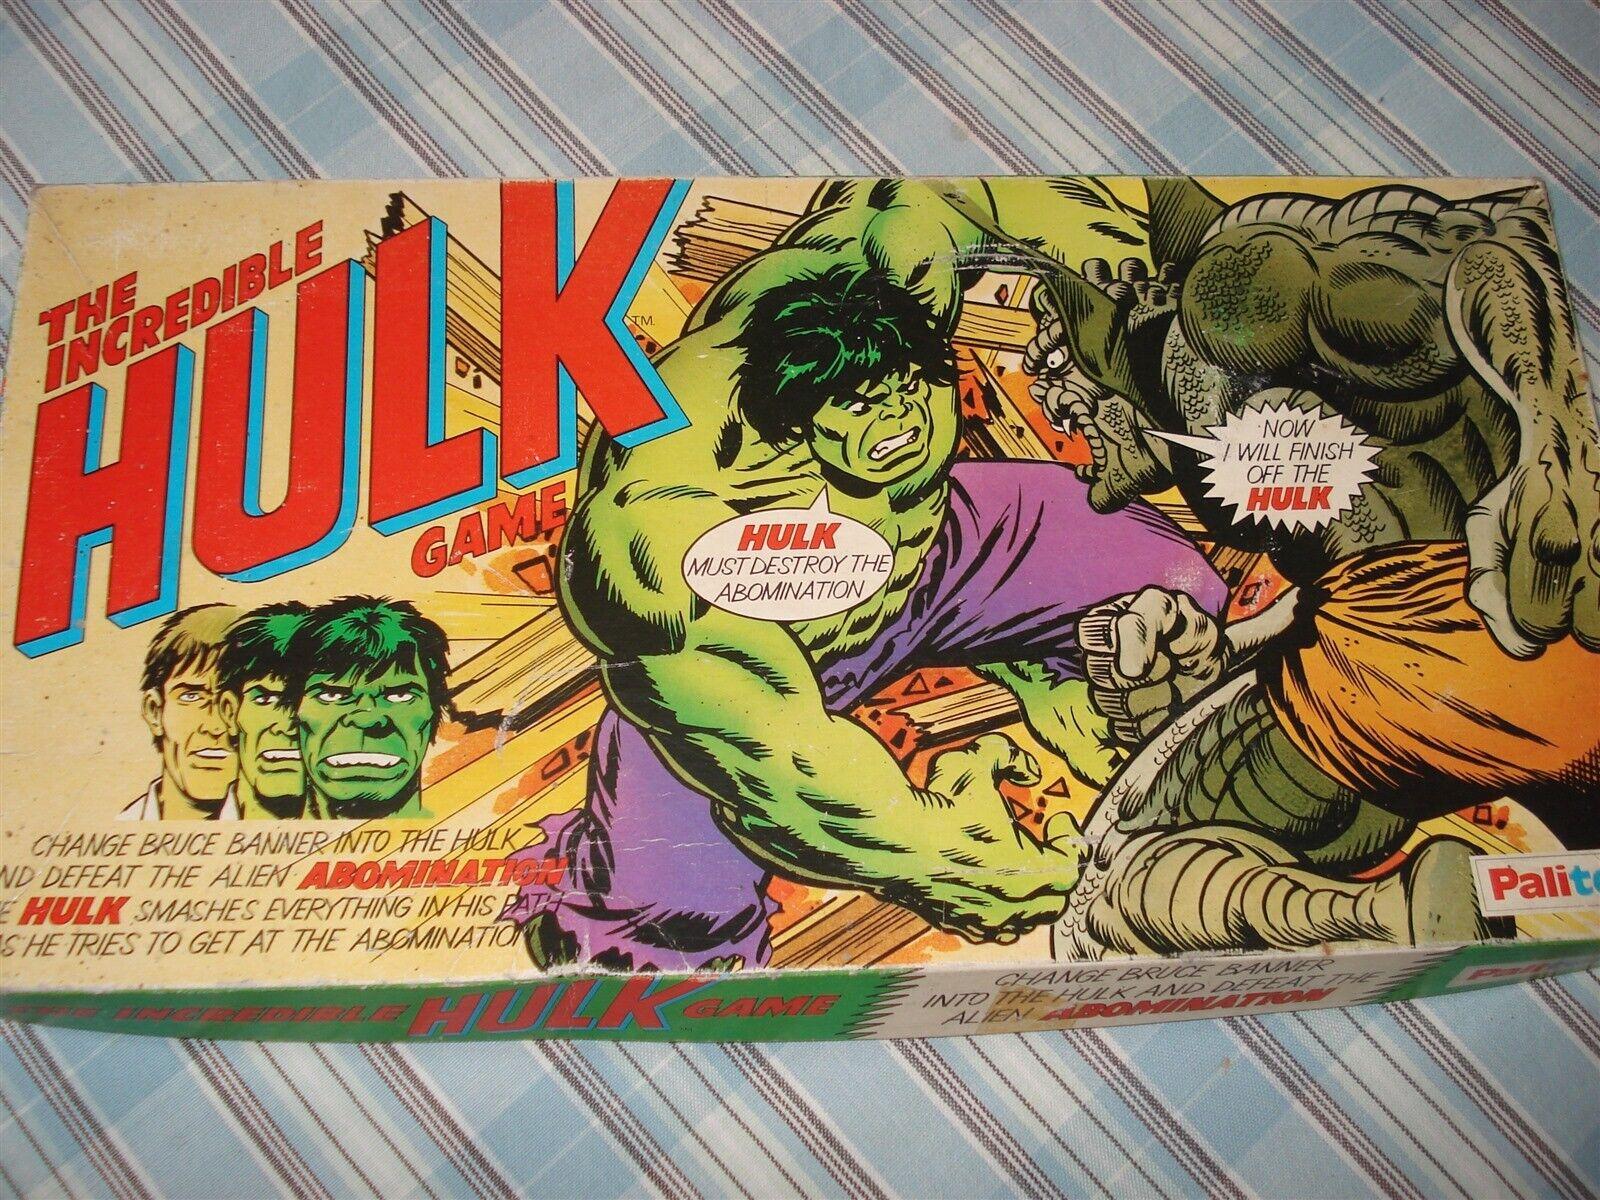 THE INCREDIBLE HULK GAME - PALITOY - 1979 - RARE - INCREDIBLE HULK GAME - HULK